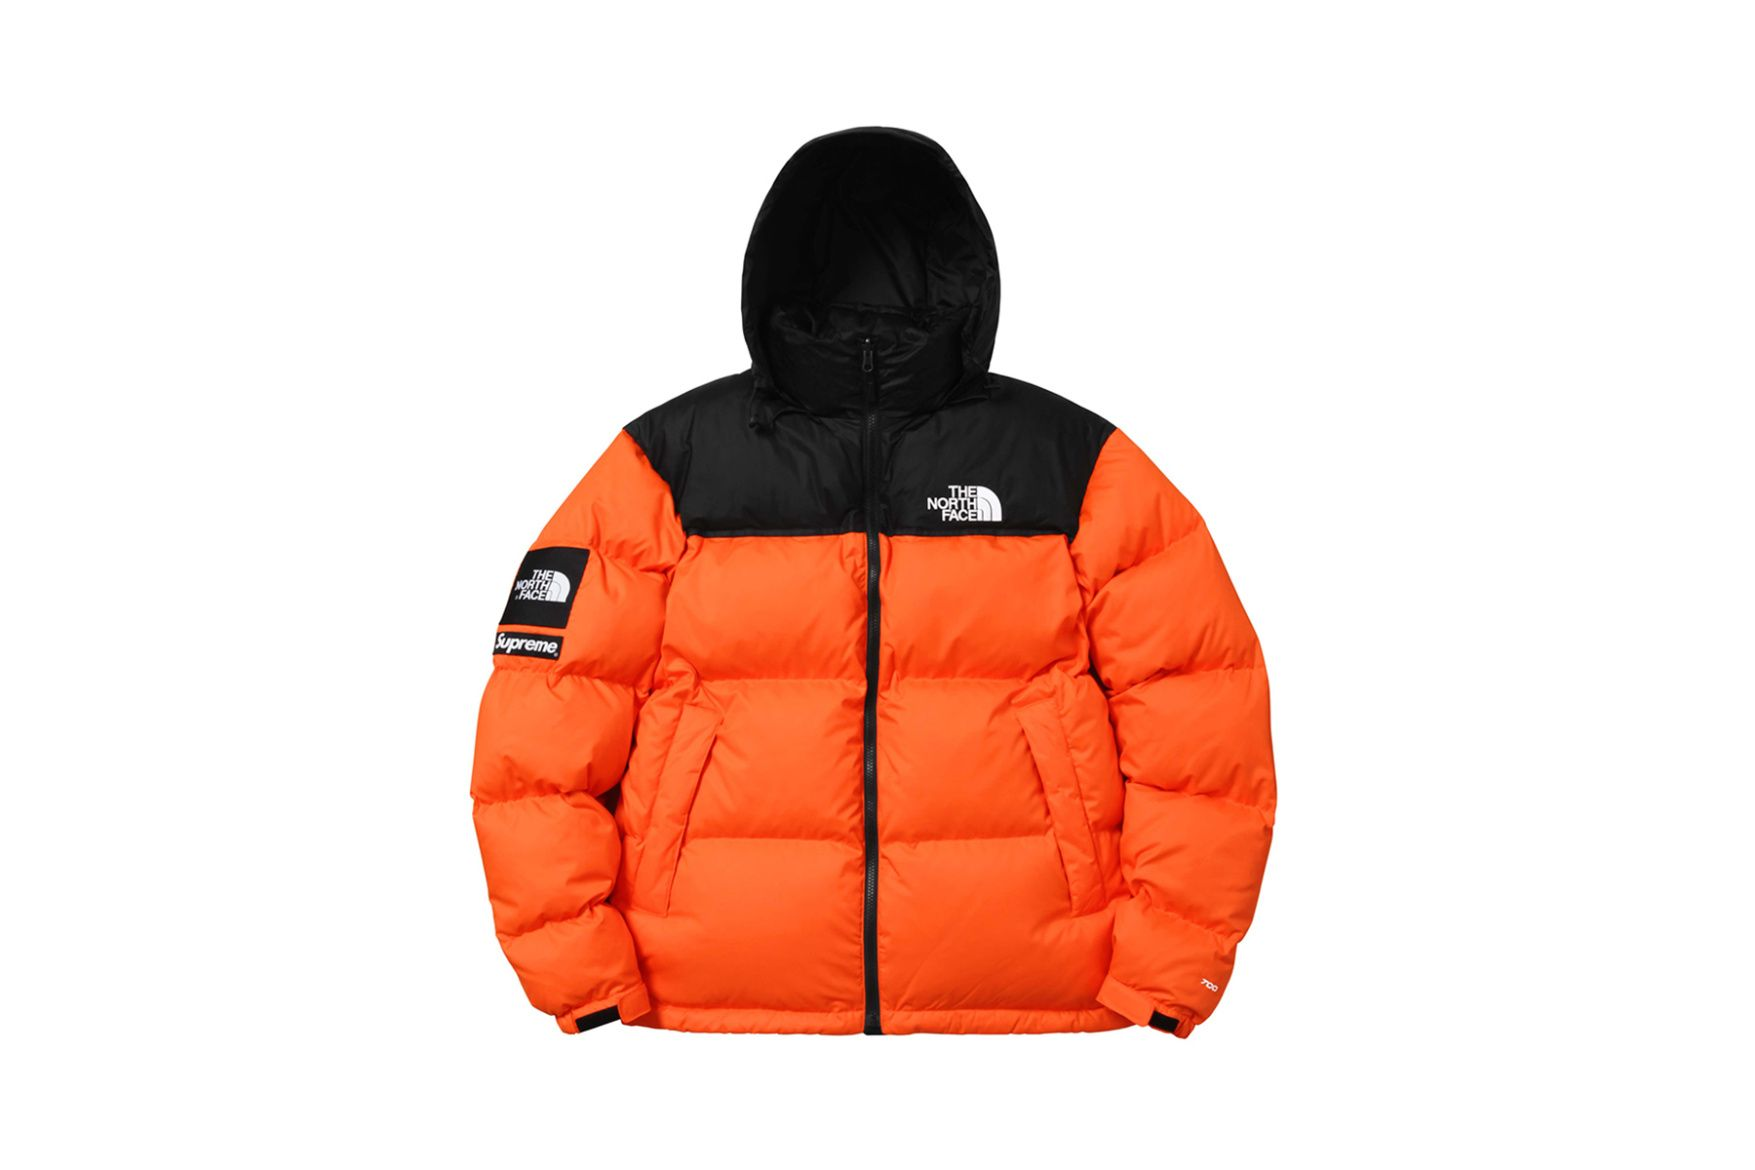 Supreme X The North Face 2016 Fall Winter Collection North Face Jacket North Face Puffer Jacket North Face Nuptse Jacket